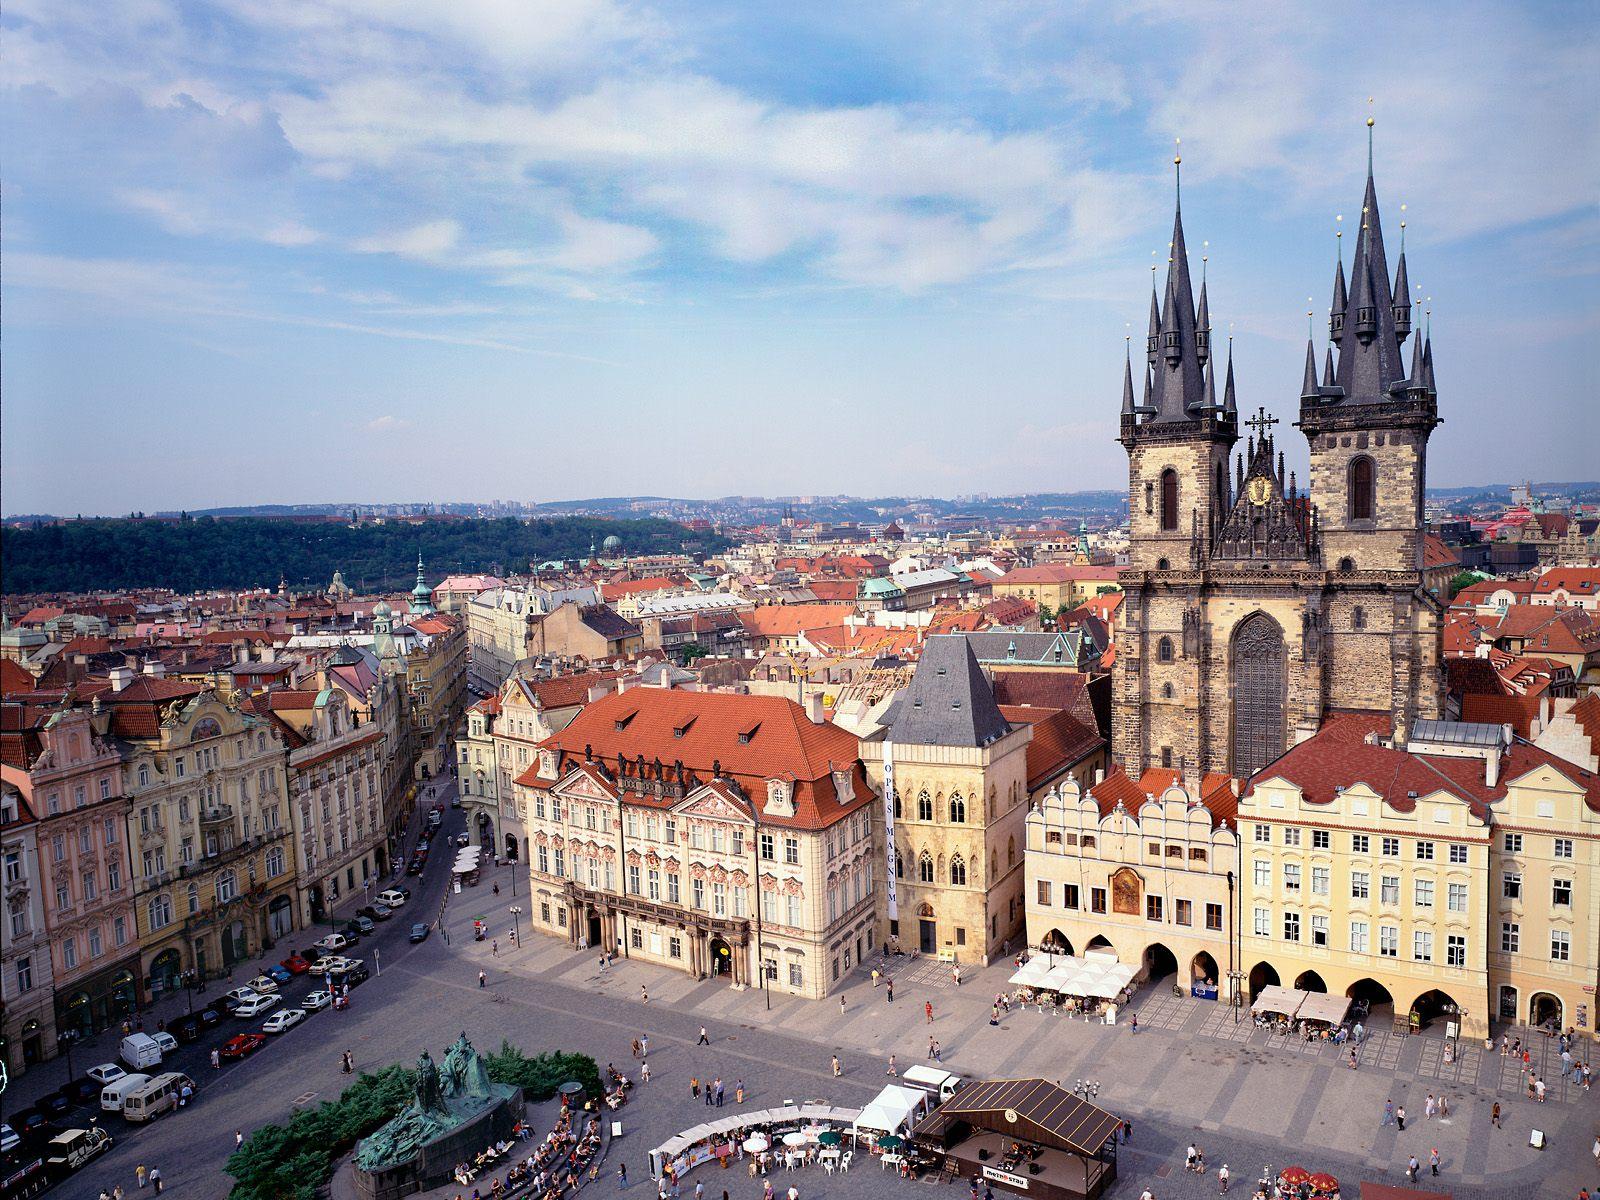 Dieci cose gratuite da fare a Praga